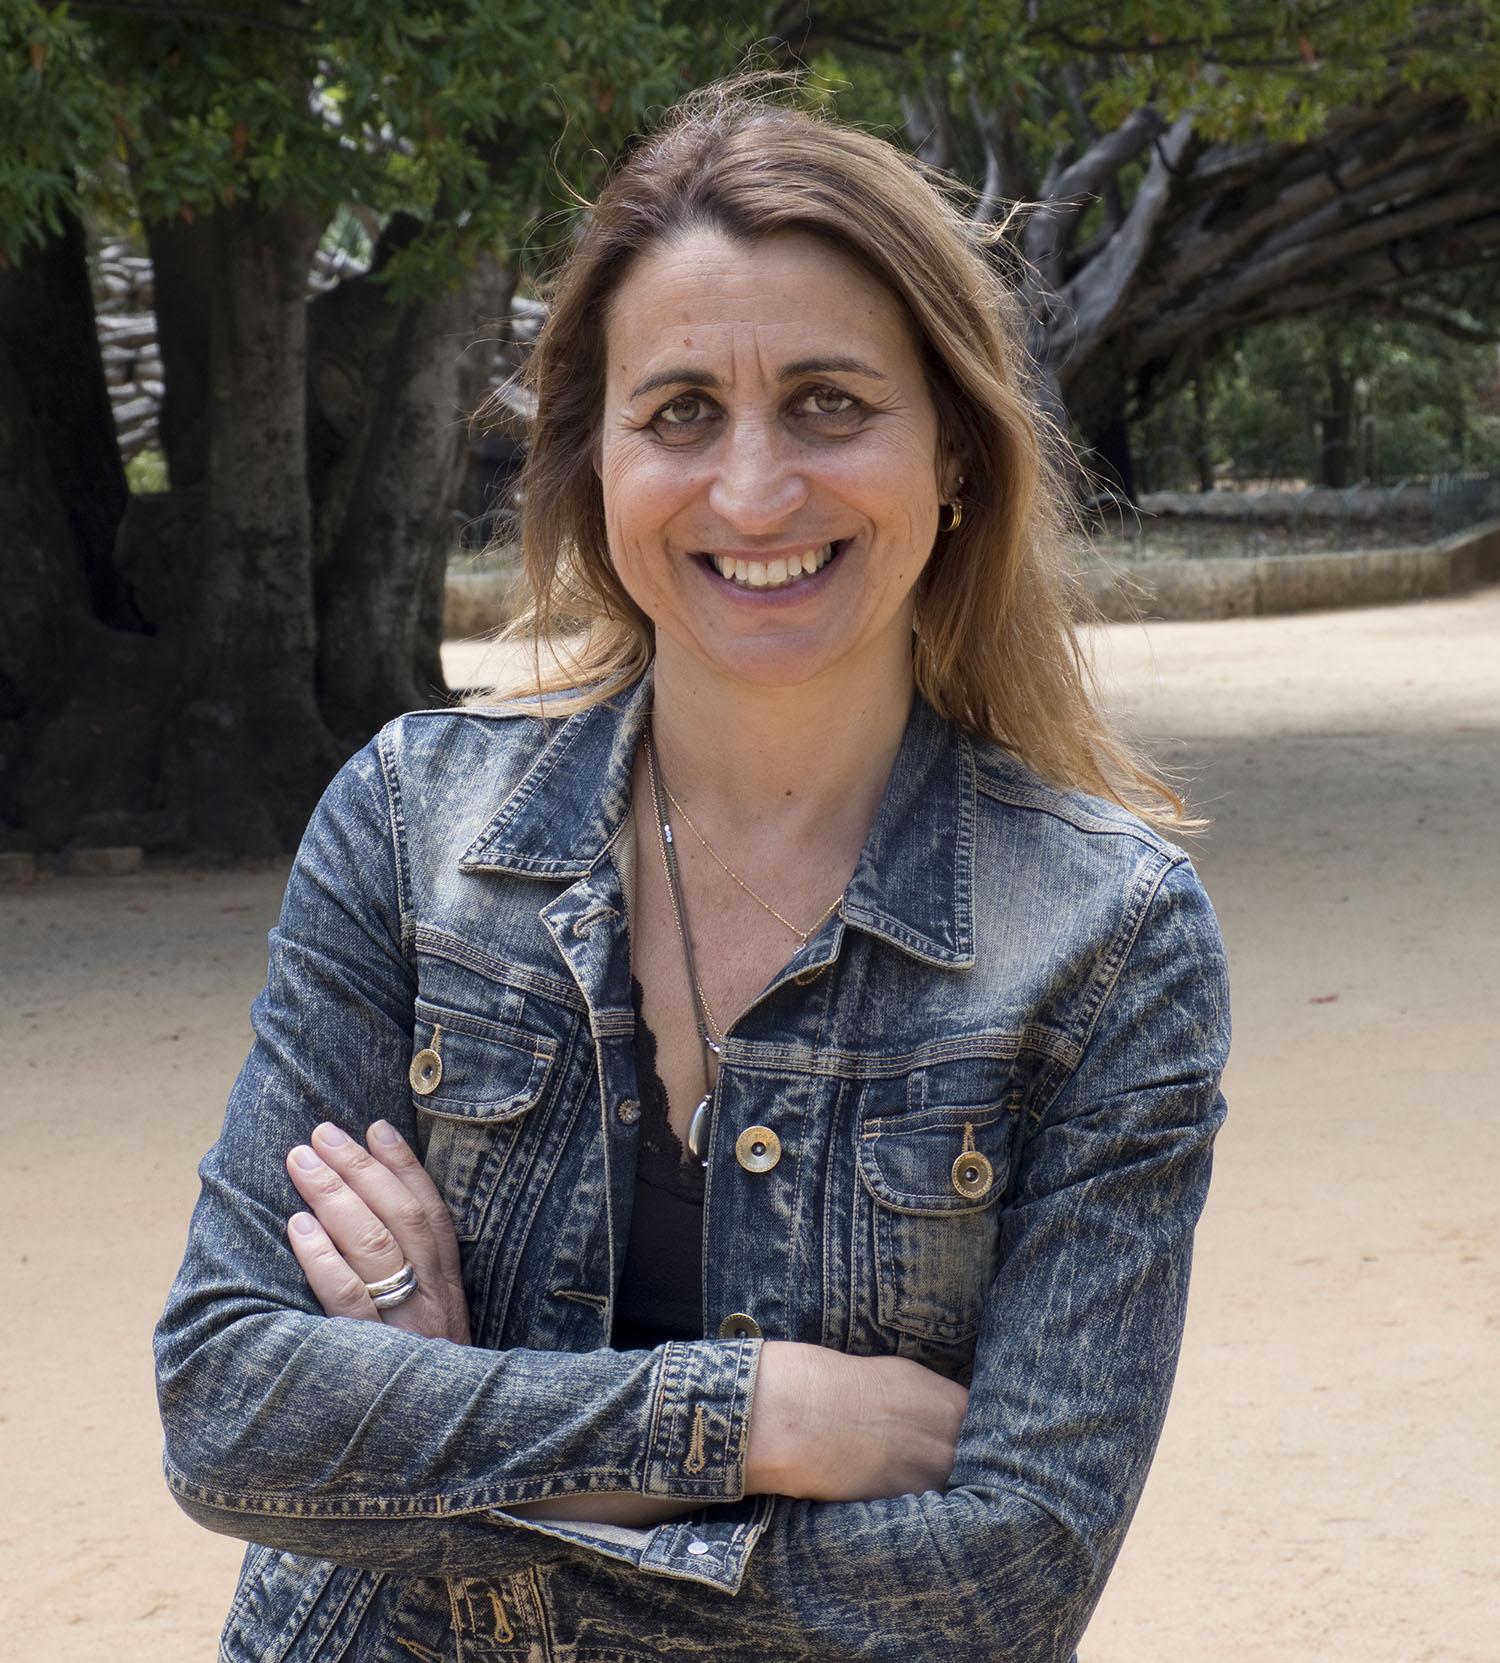 Ana Luísa Soares